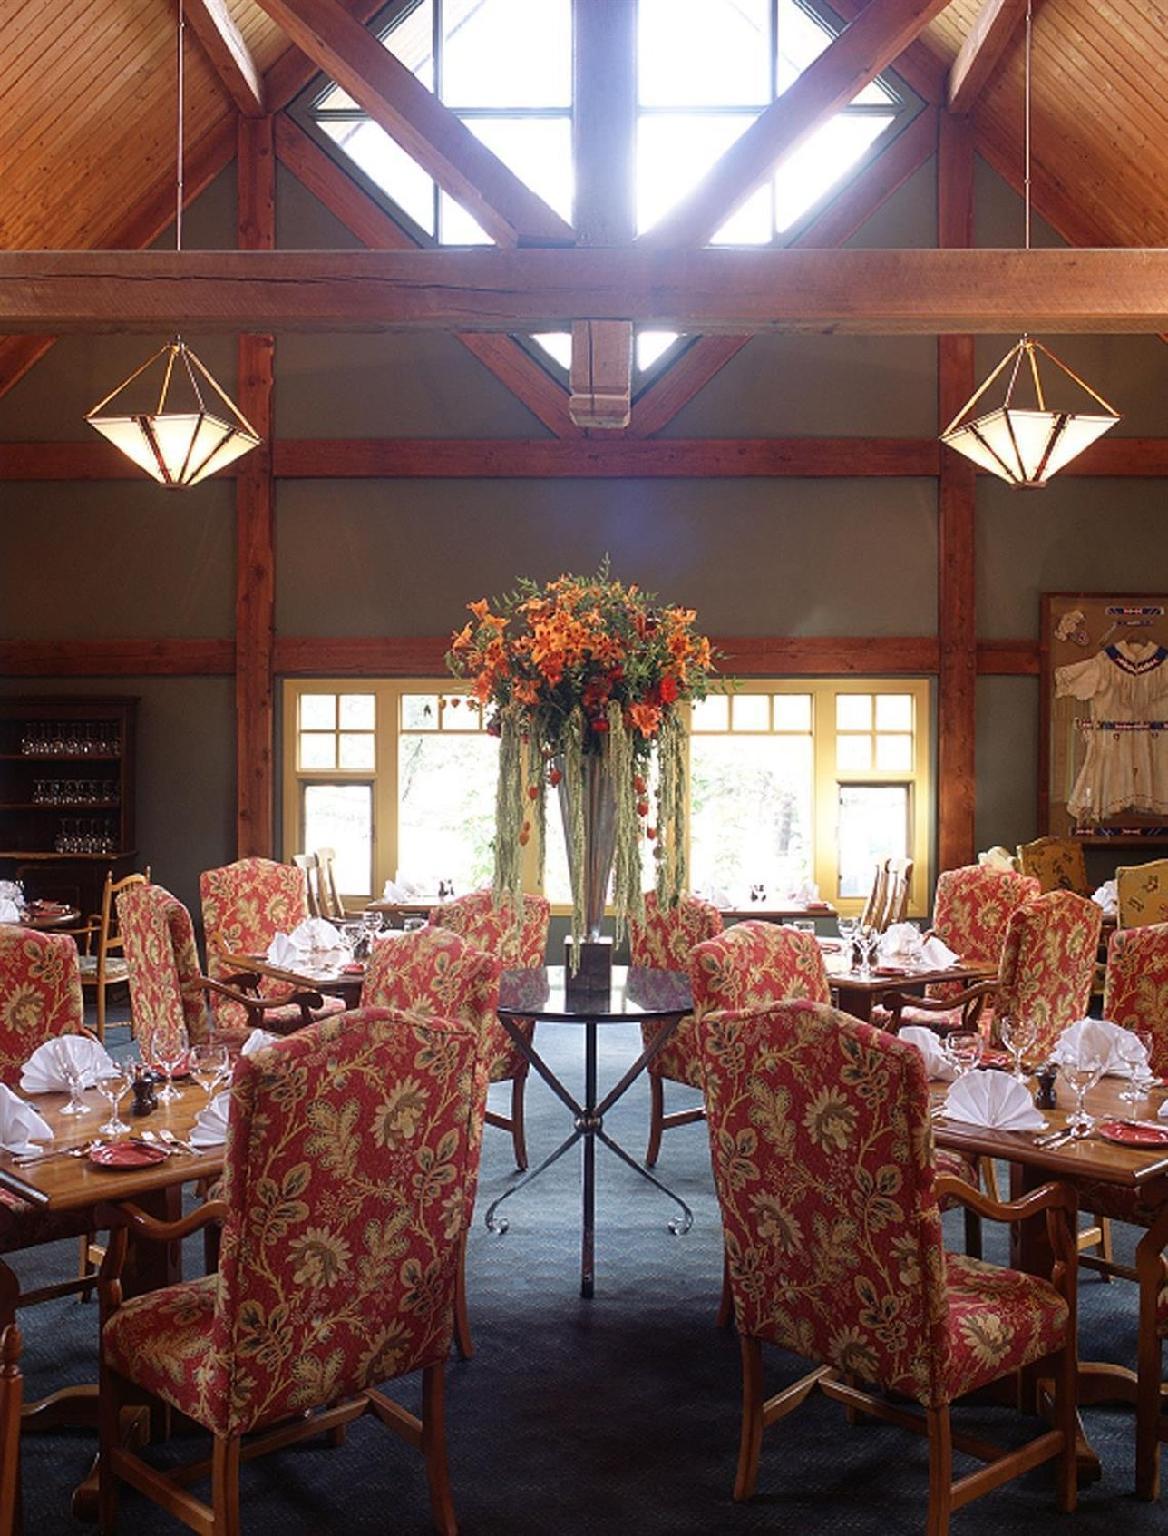 Buffalo Mountain Lodge, Division No. 15